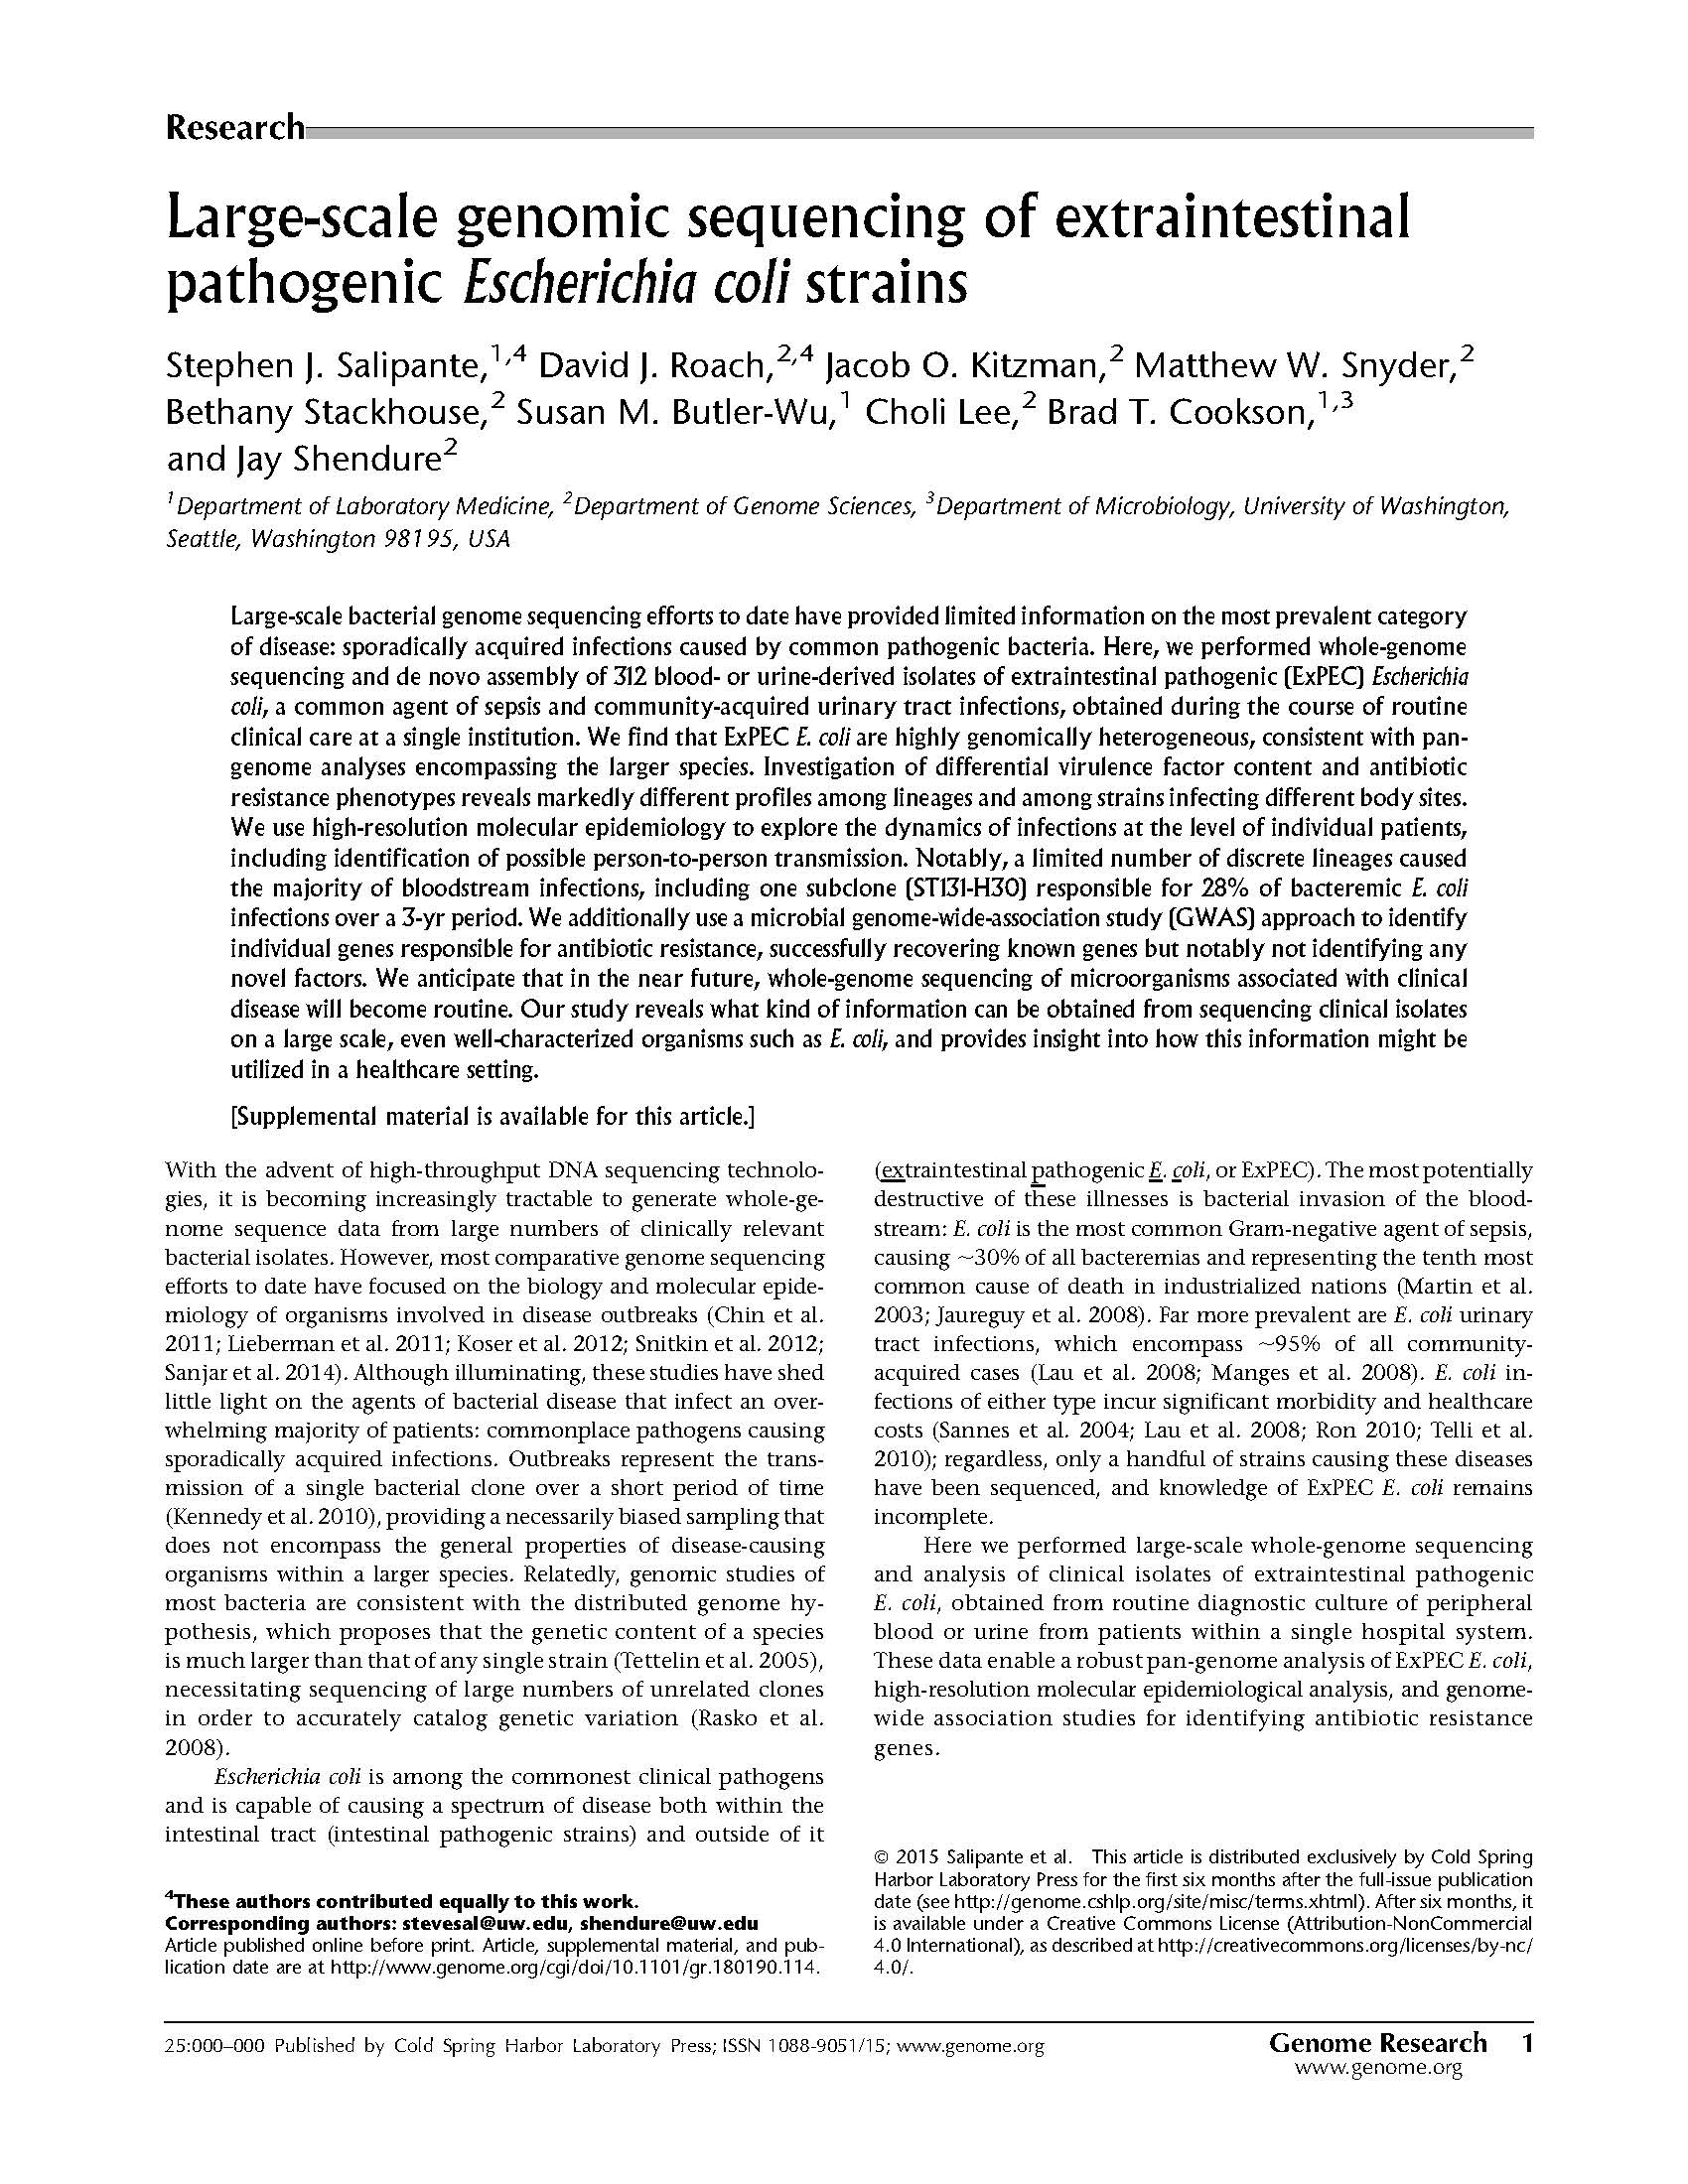 escherichia coli research paper View escherichia coli research papers on academiaedu for free.